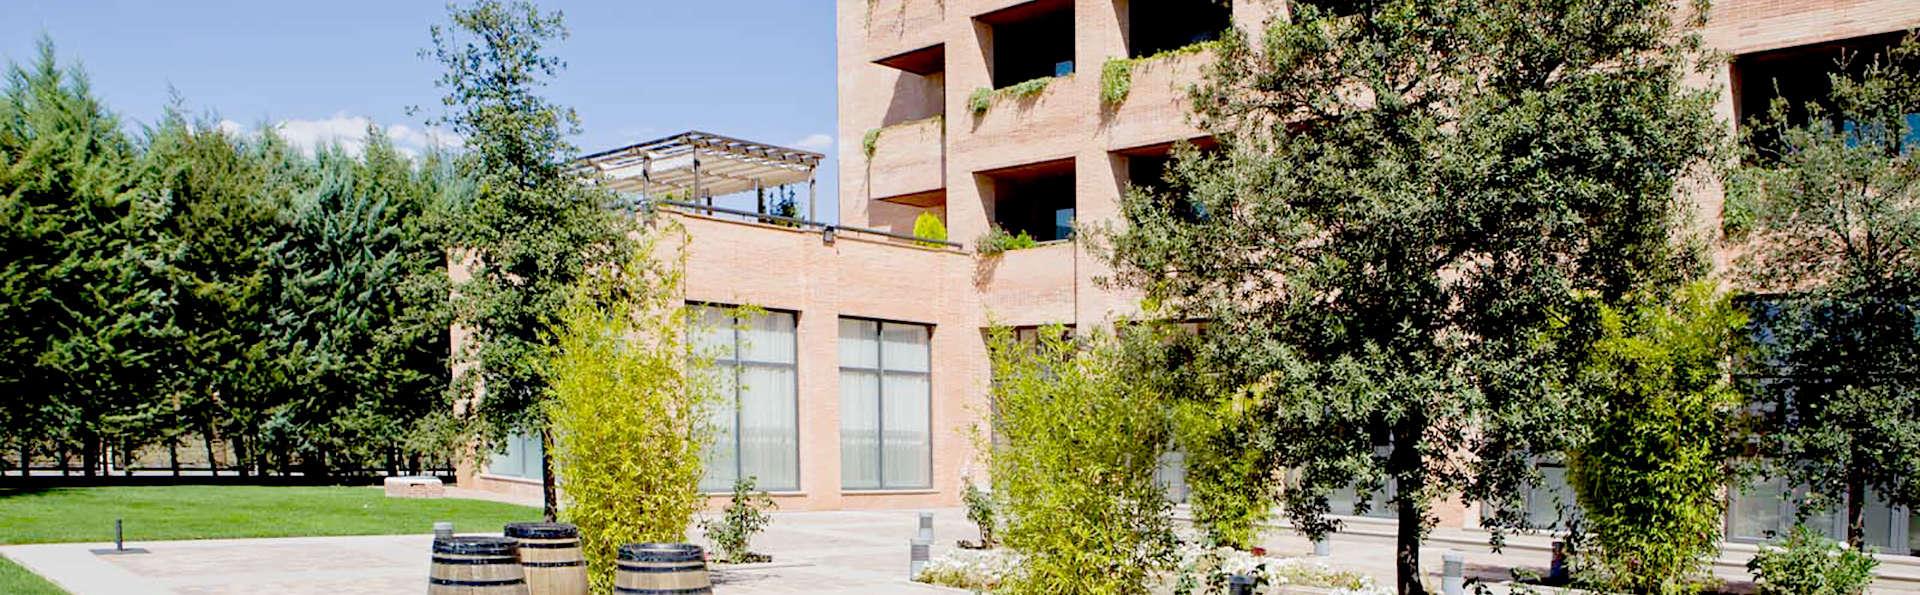 Hotel Intur Alcázar de San Juan - Edit_front.jpg